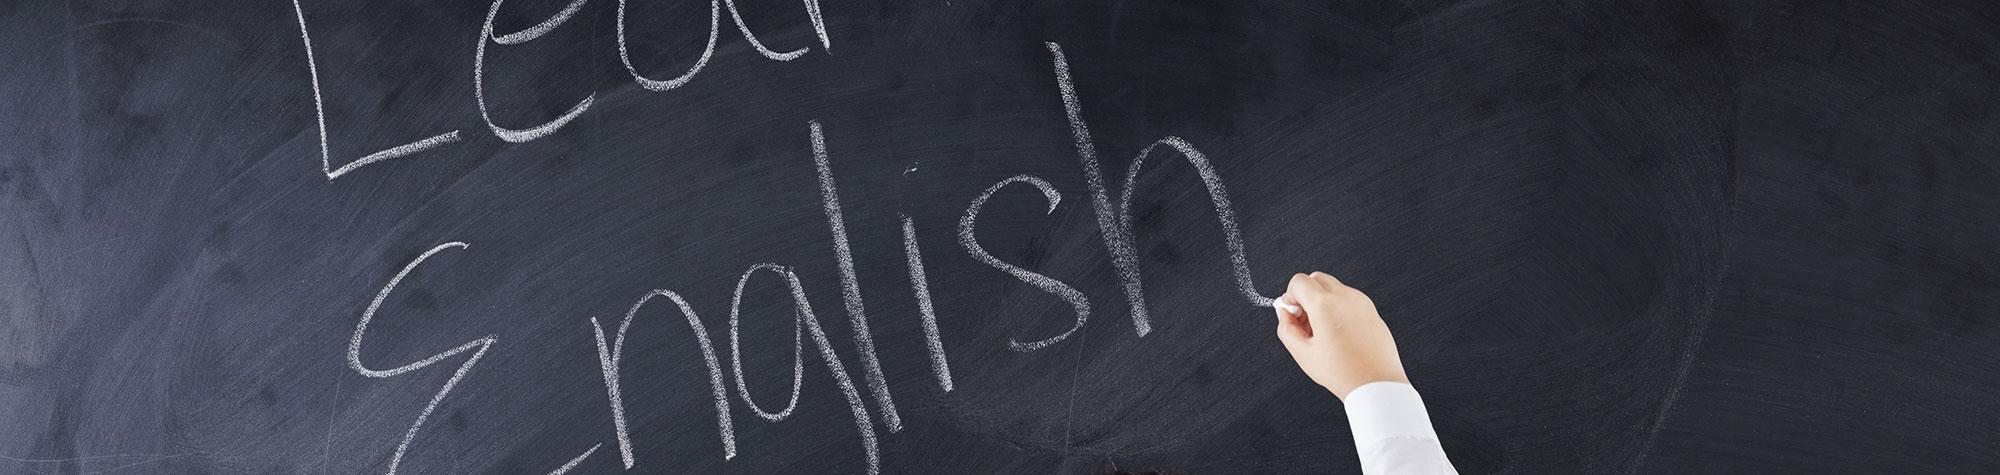 Suggestopedia ile İngilizce Eğitimi